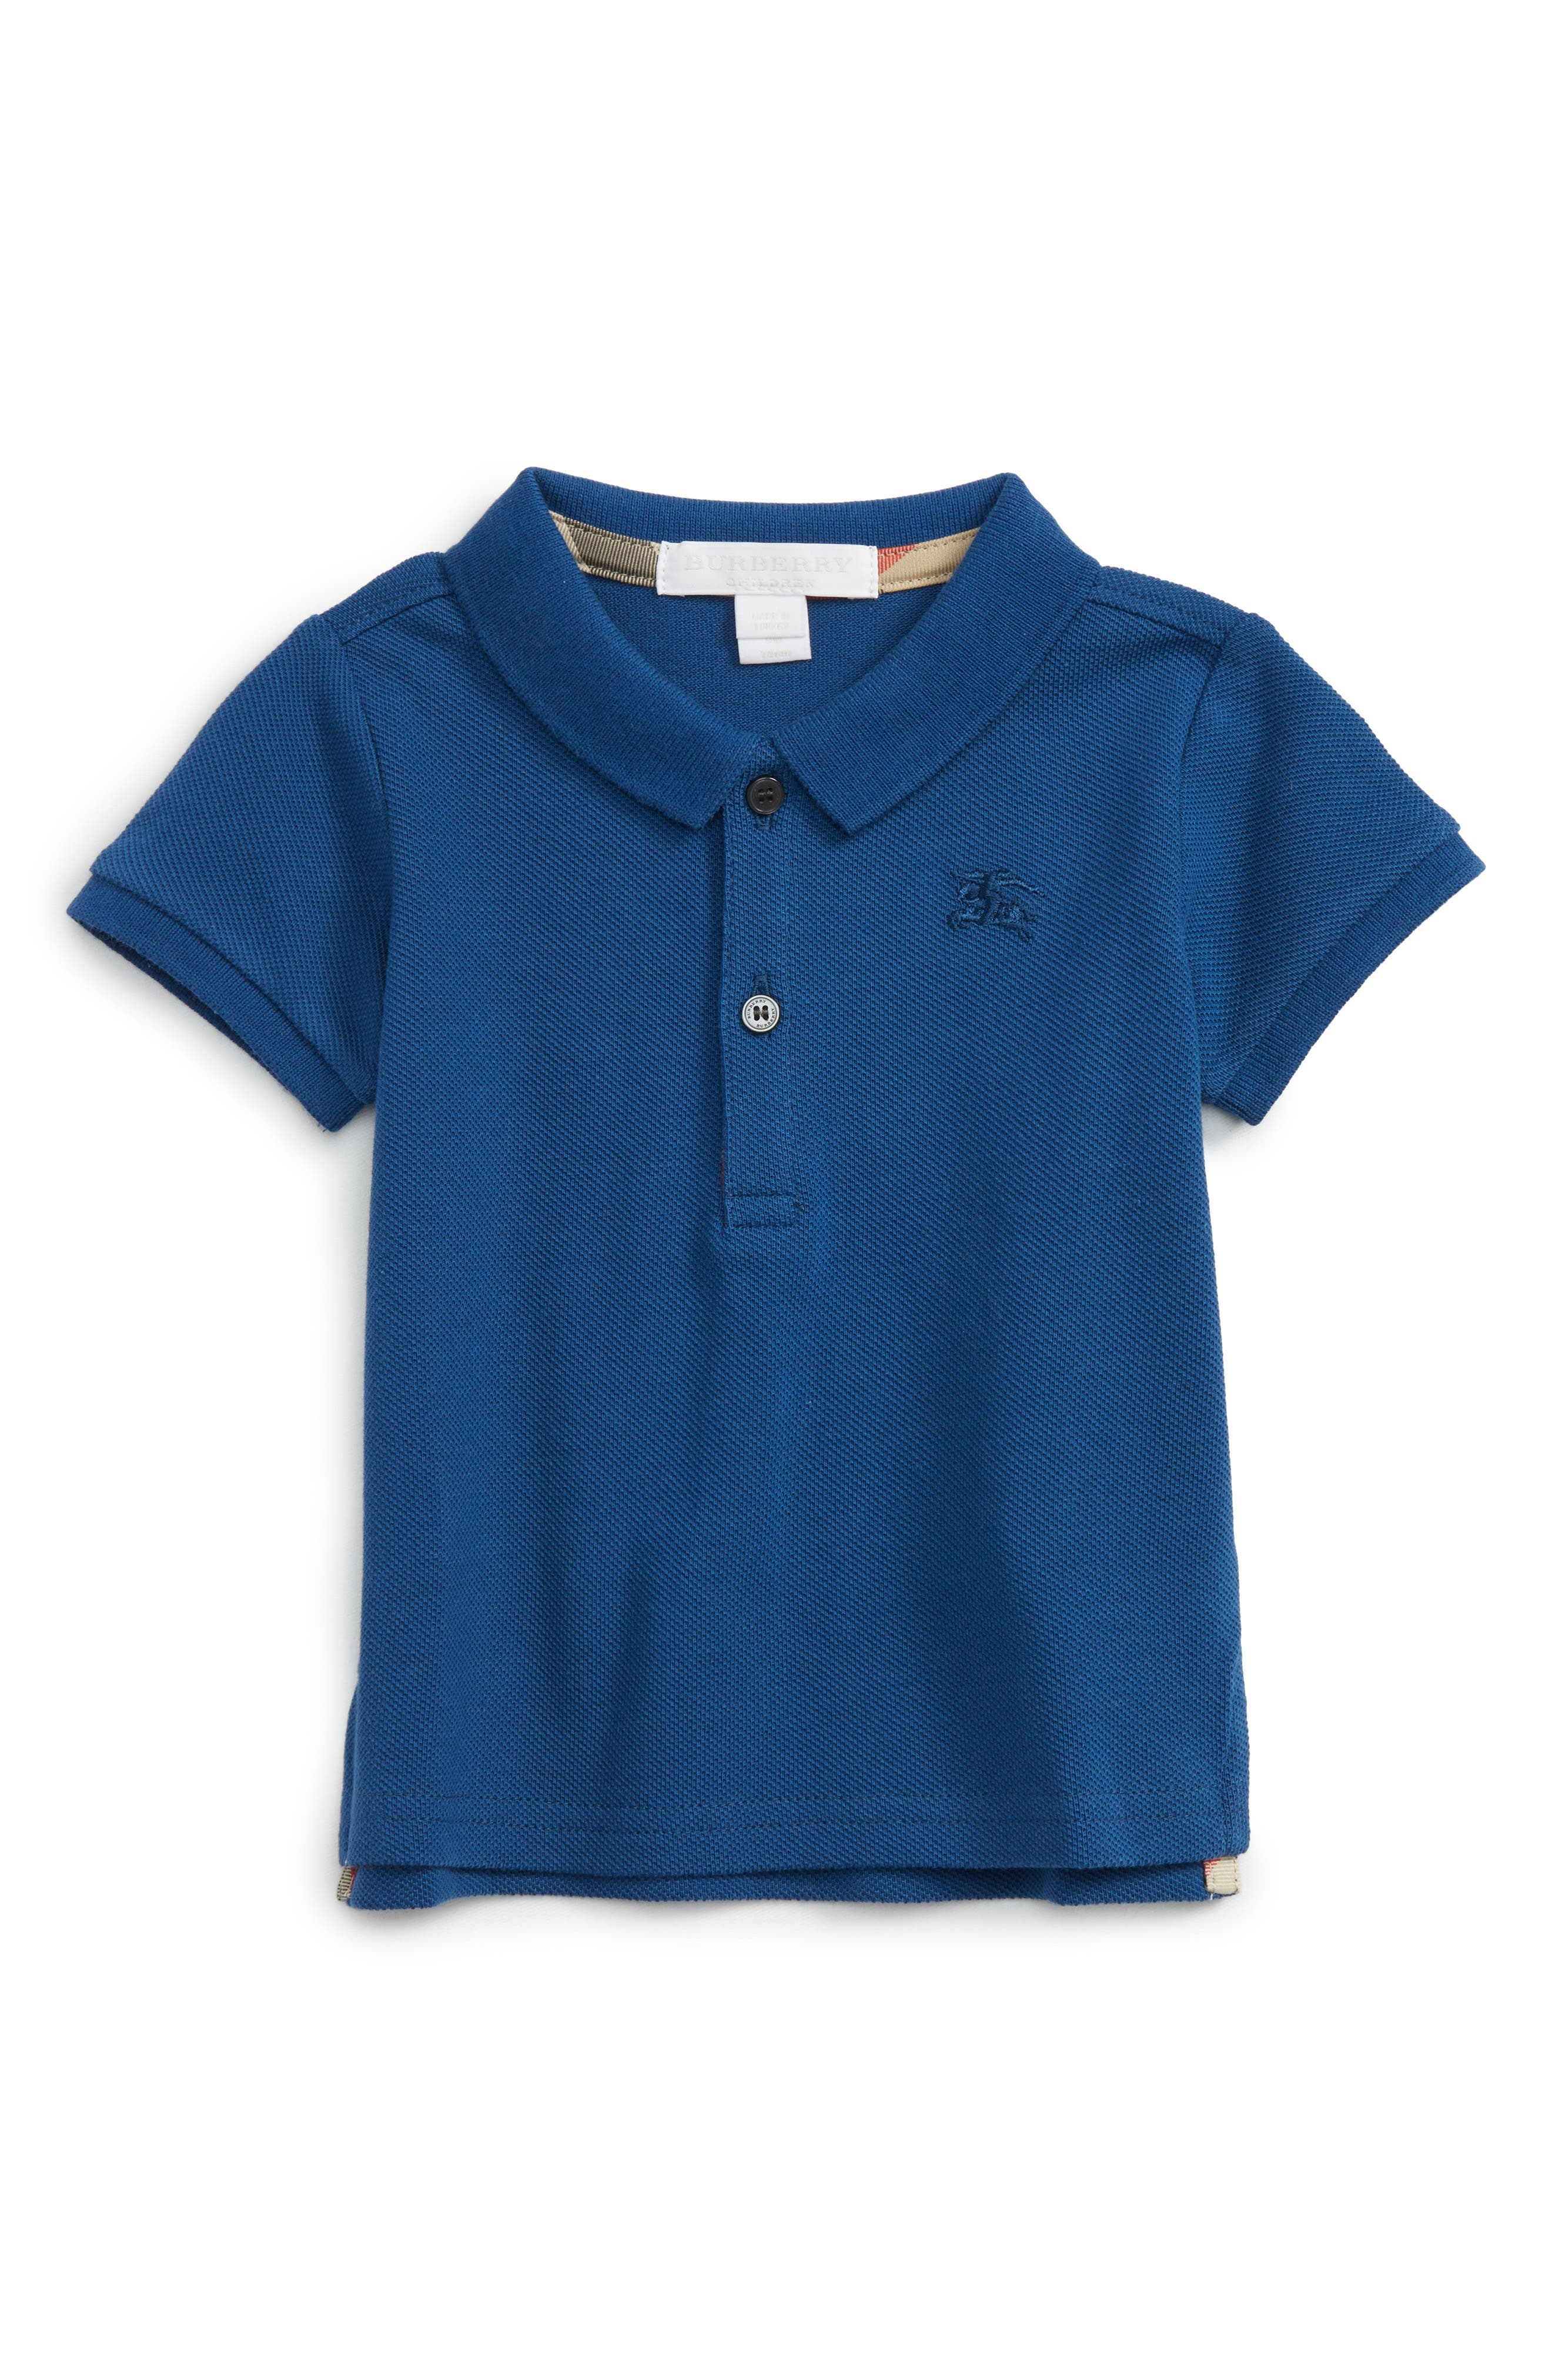 Palmer Piqué Polo,                         Main,                         color, Marine Blue